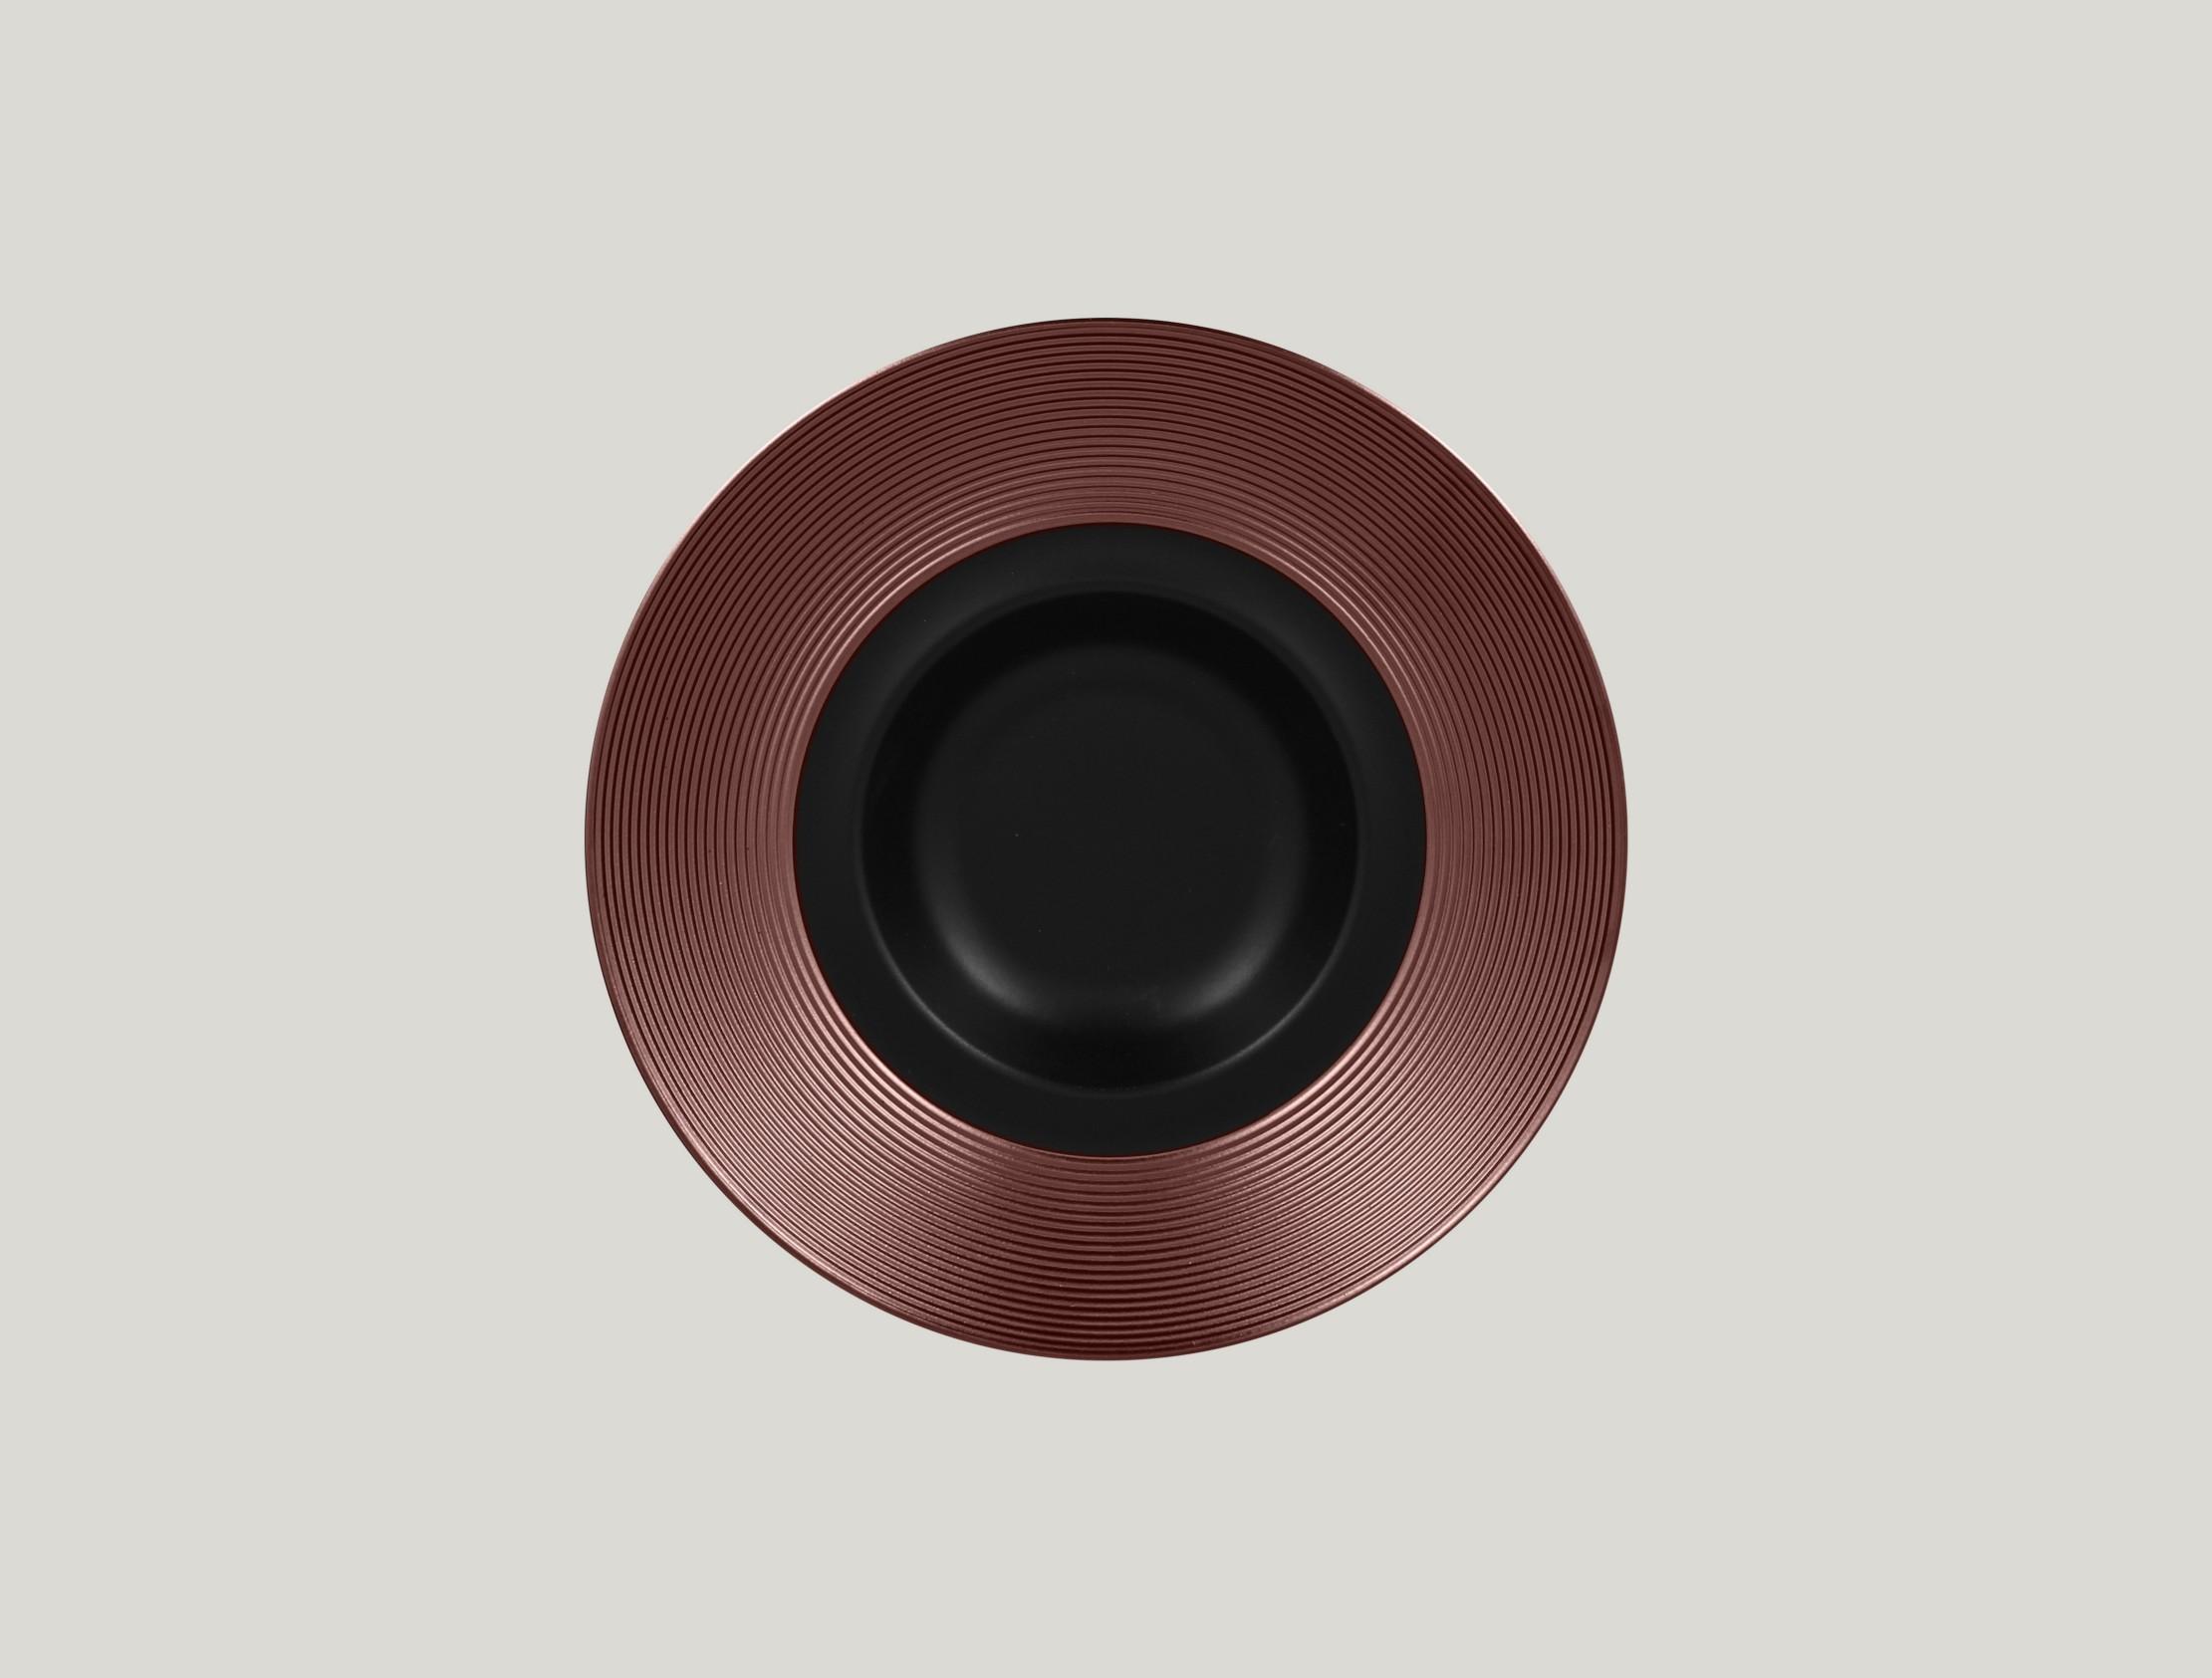 Gourmet hluboký talíř - bronze ANTIC